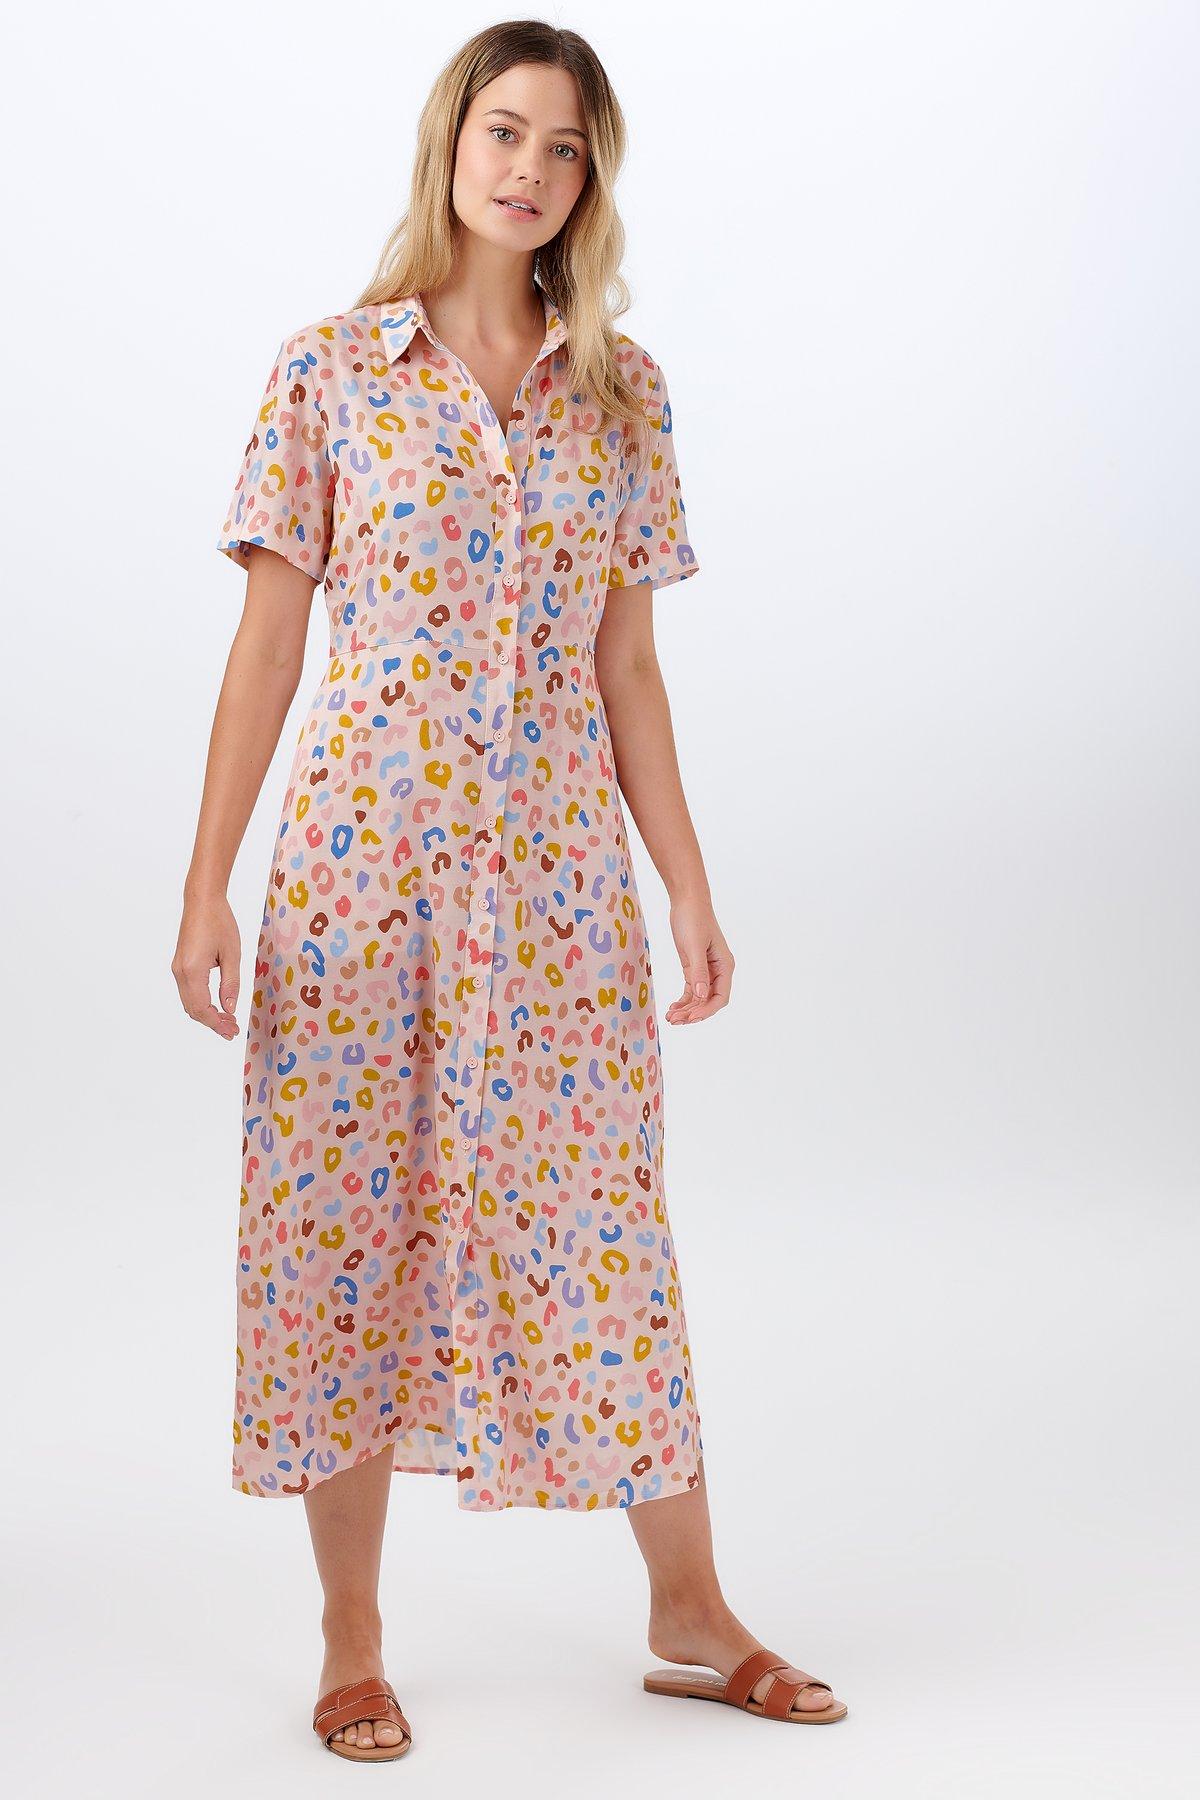 Sugarhill Brighton - Danielle Shirt Dress Pink Arthouse Leopard